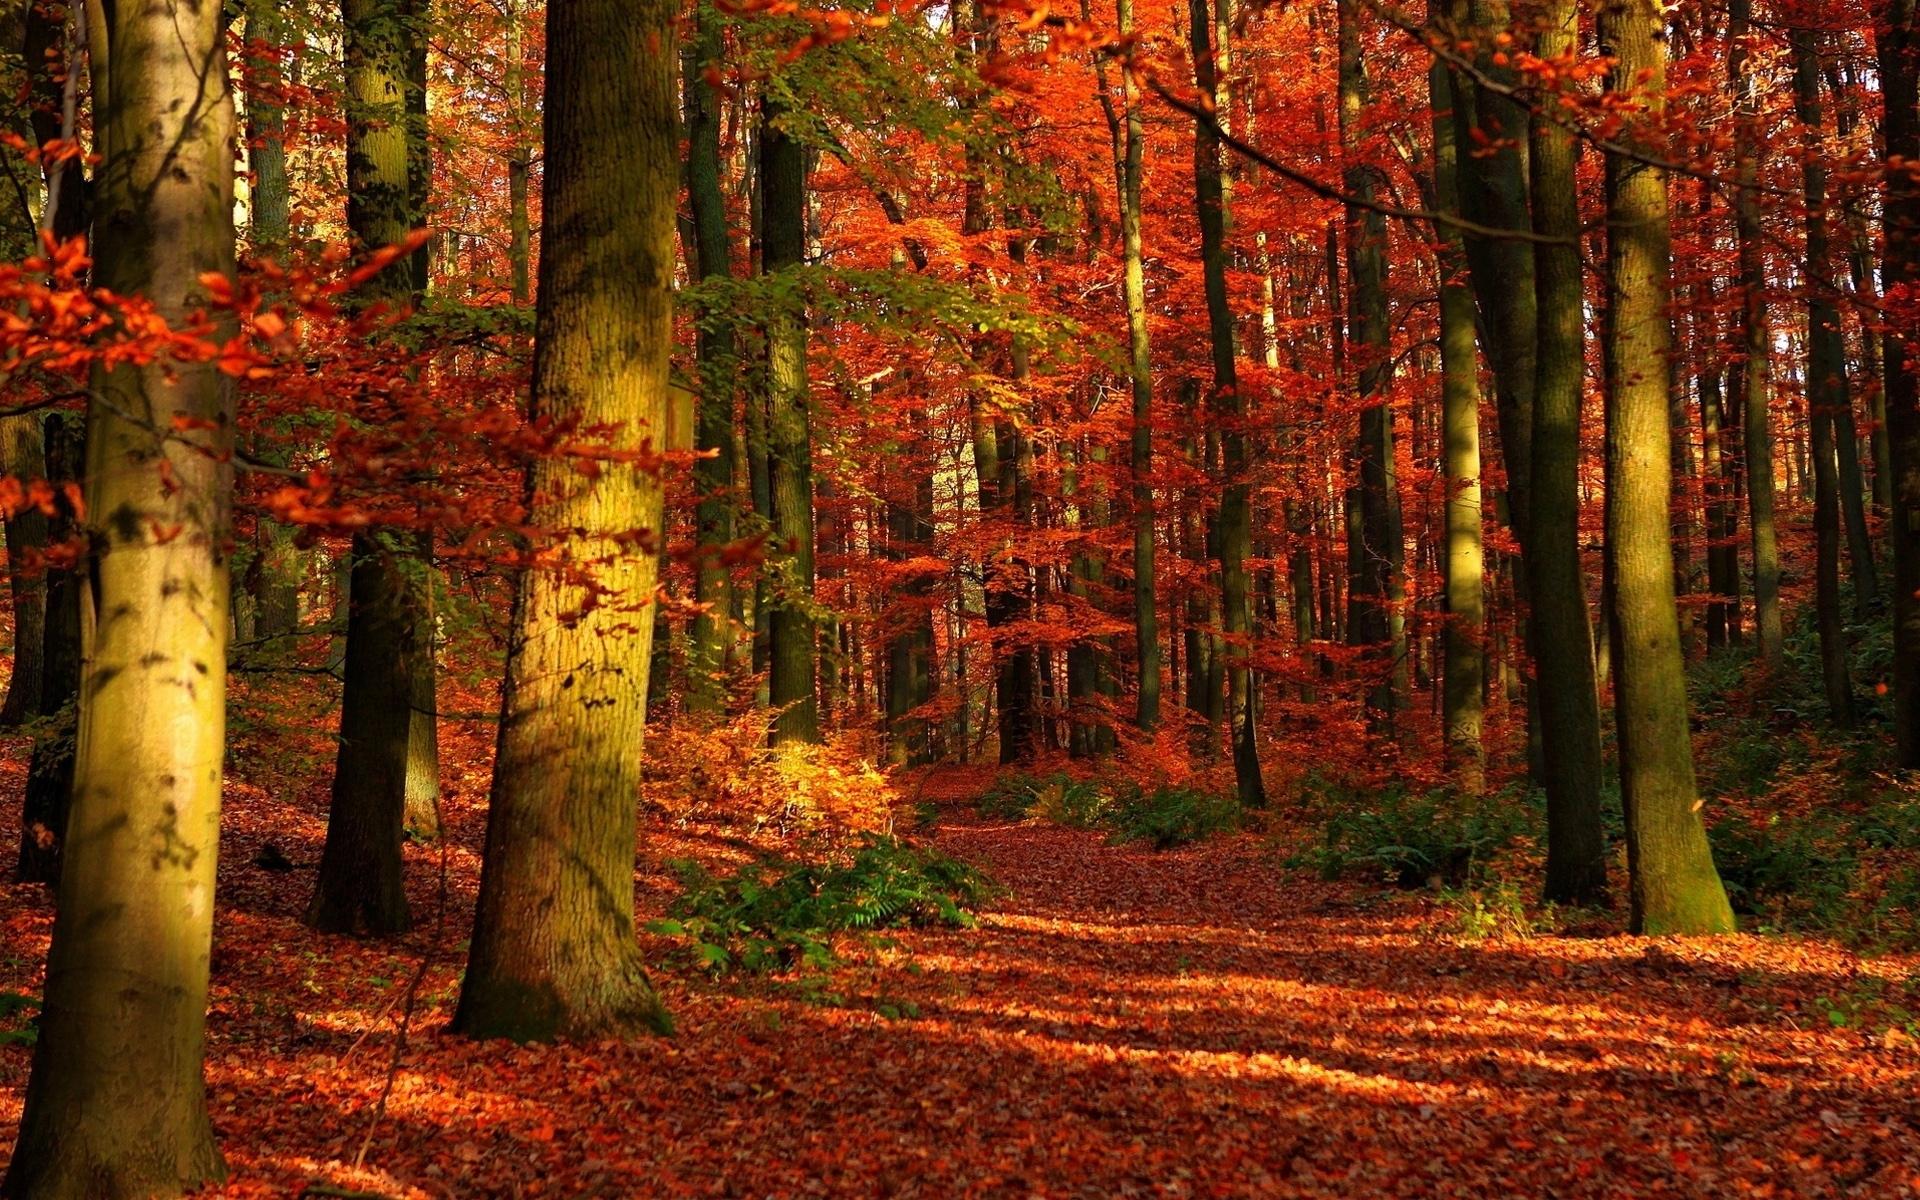 autumn forest wallpaper widescreen. - media file | pixelstalk